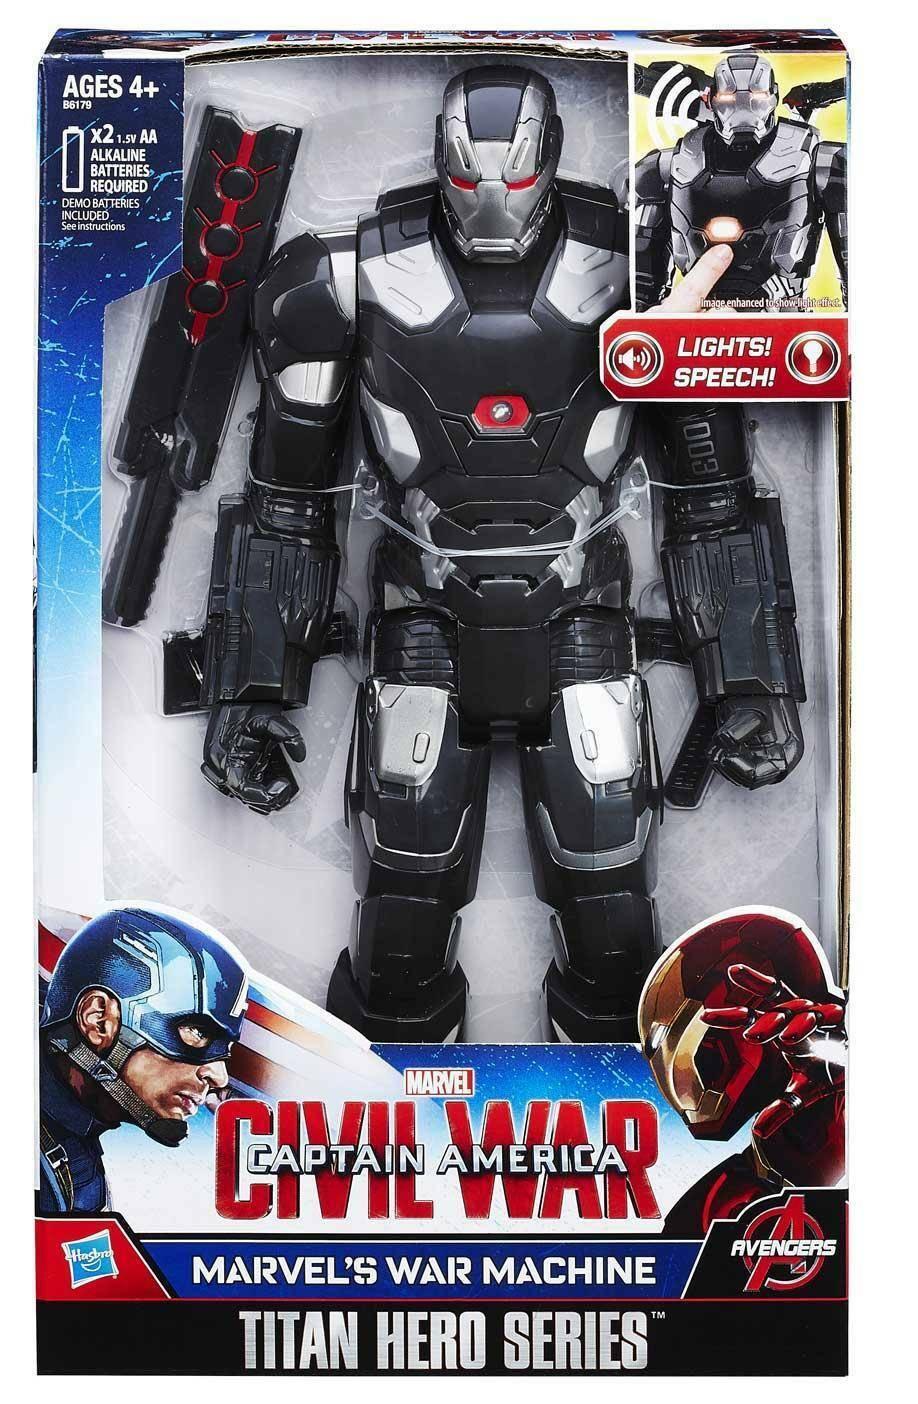 hasbro - mb hasbro - mb personagio war machine elettronico avengers